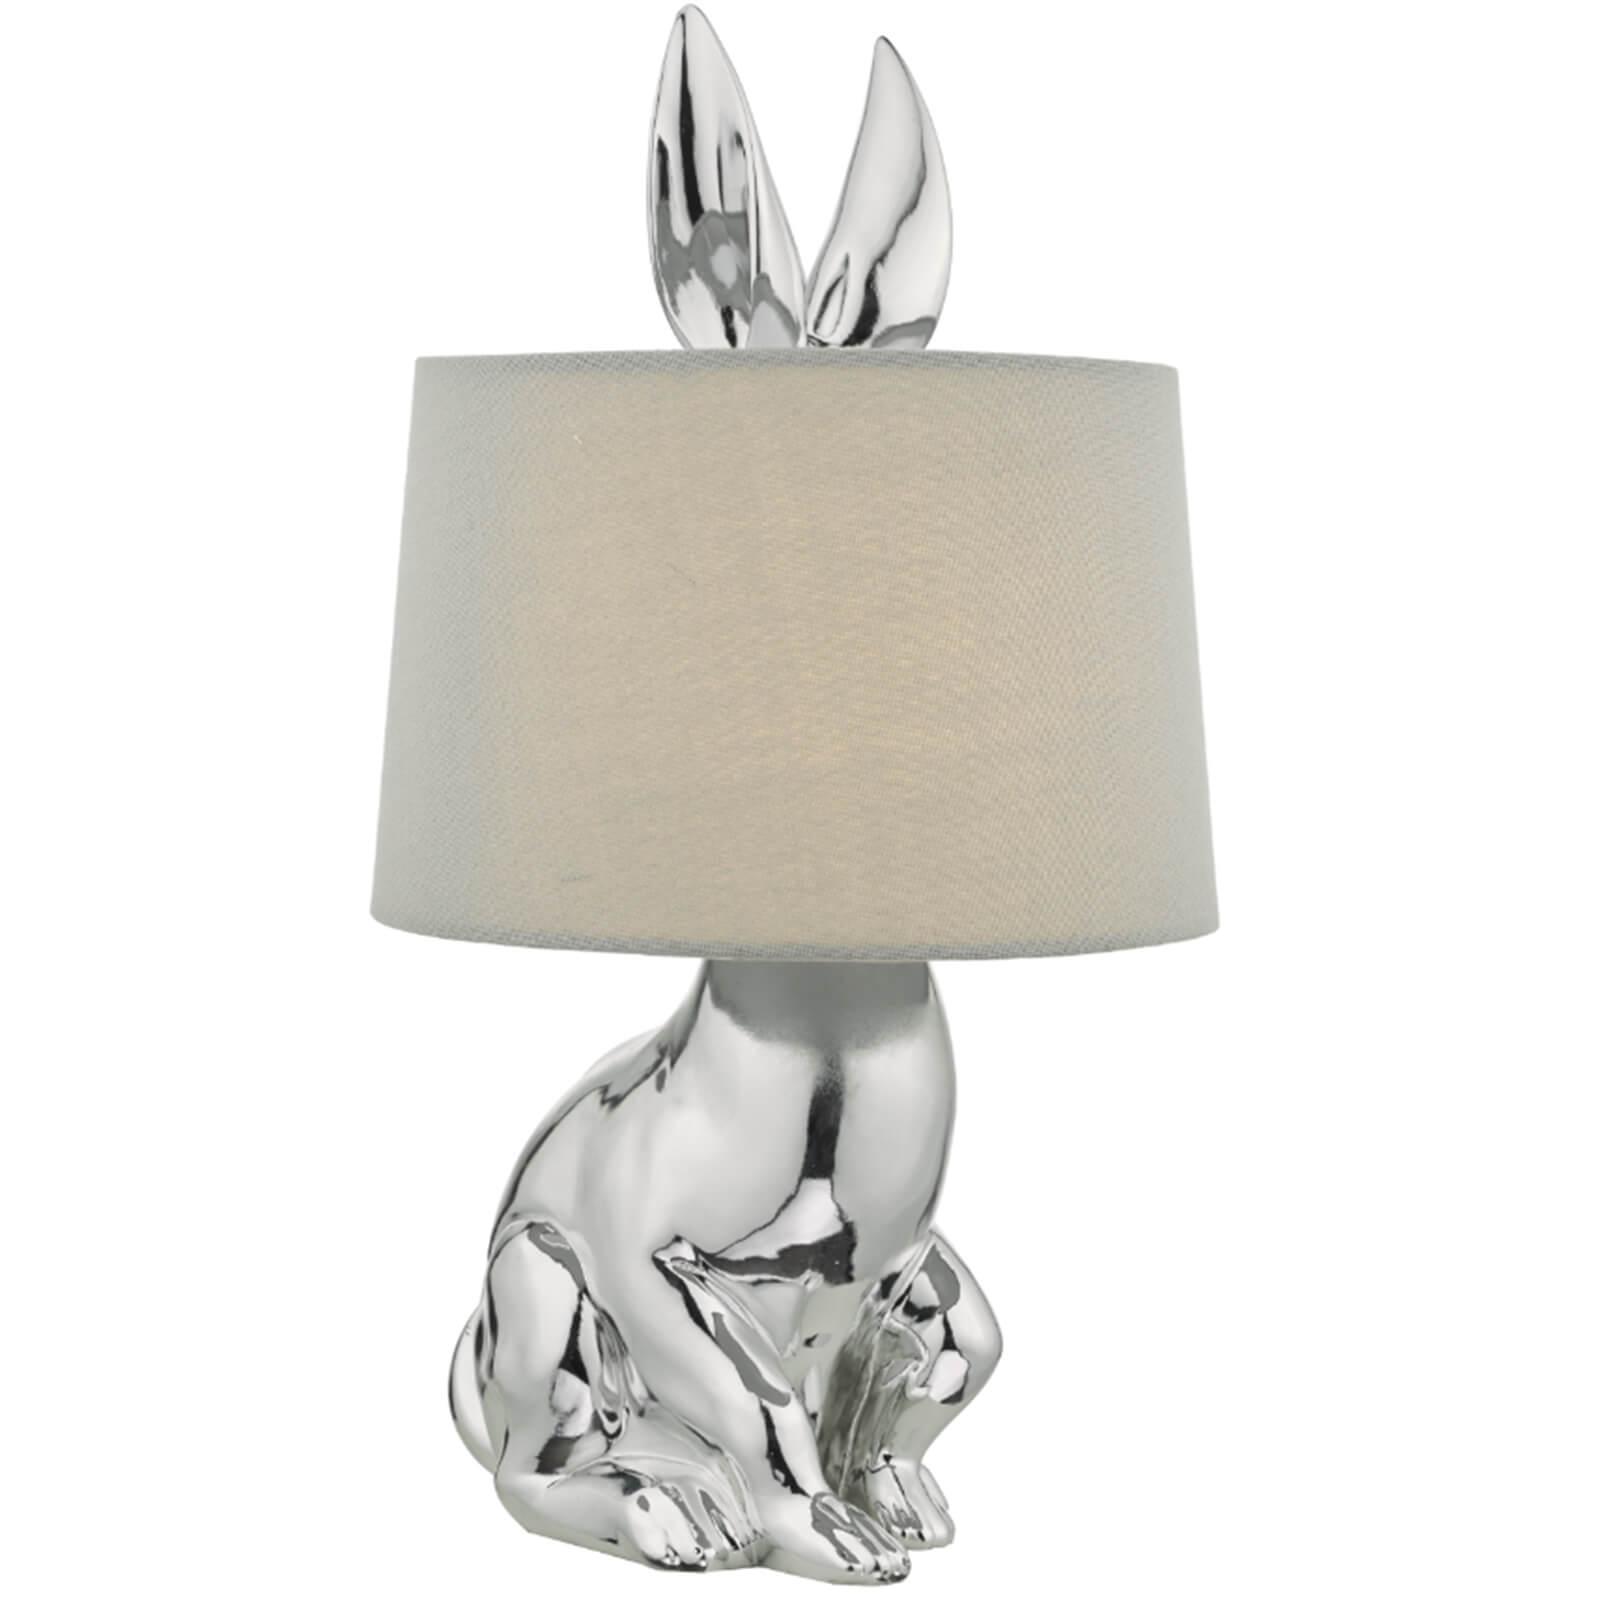 Rodger Table Lamp - Chrome